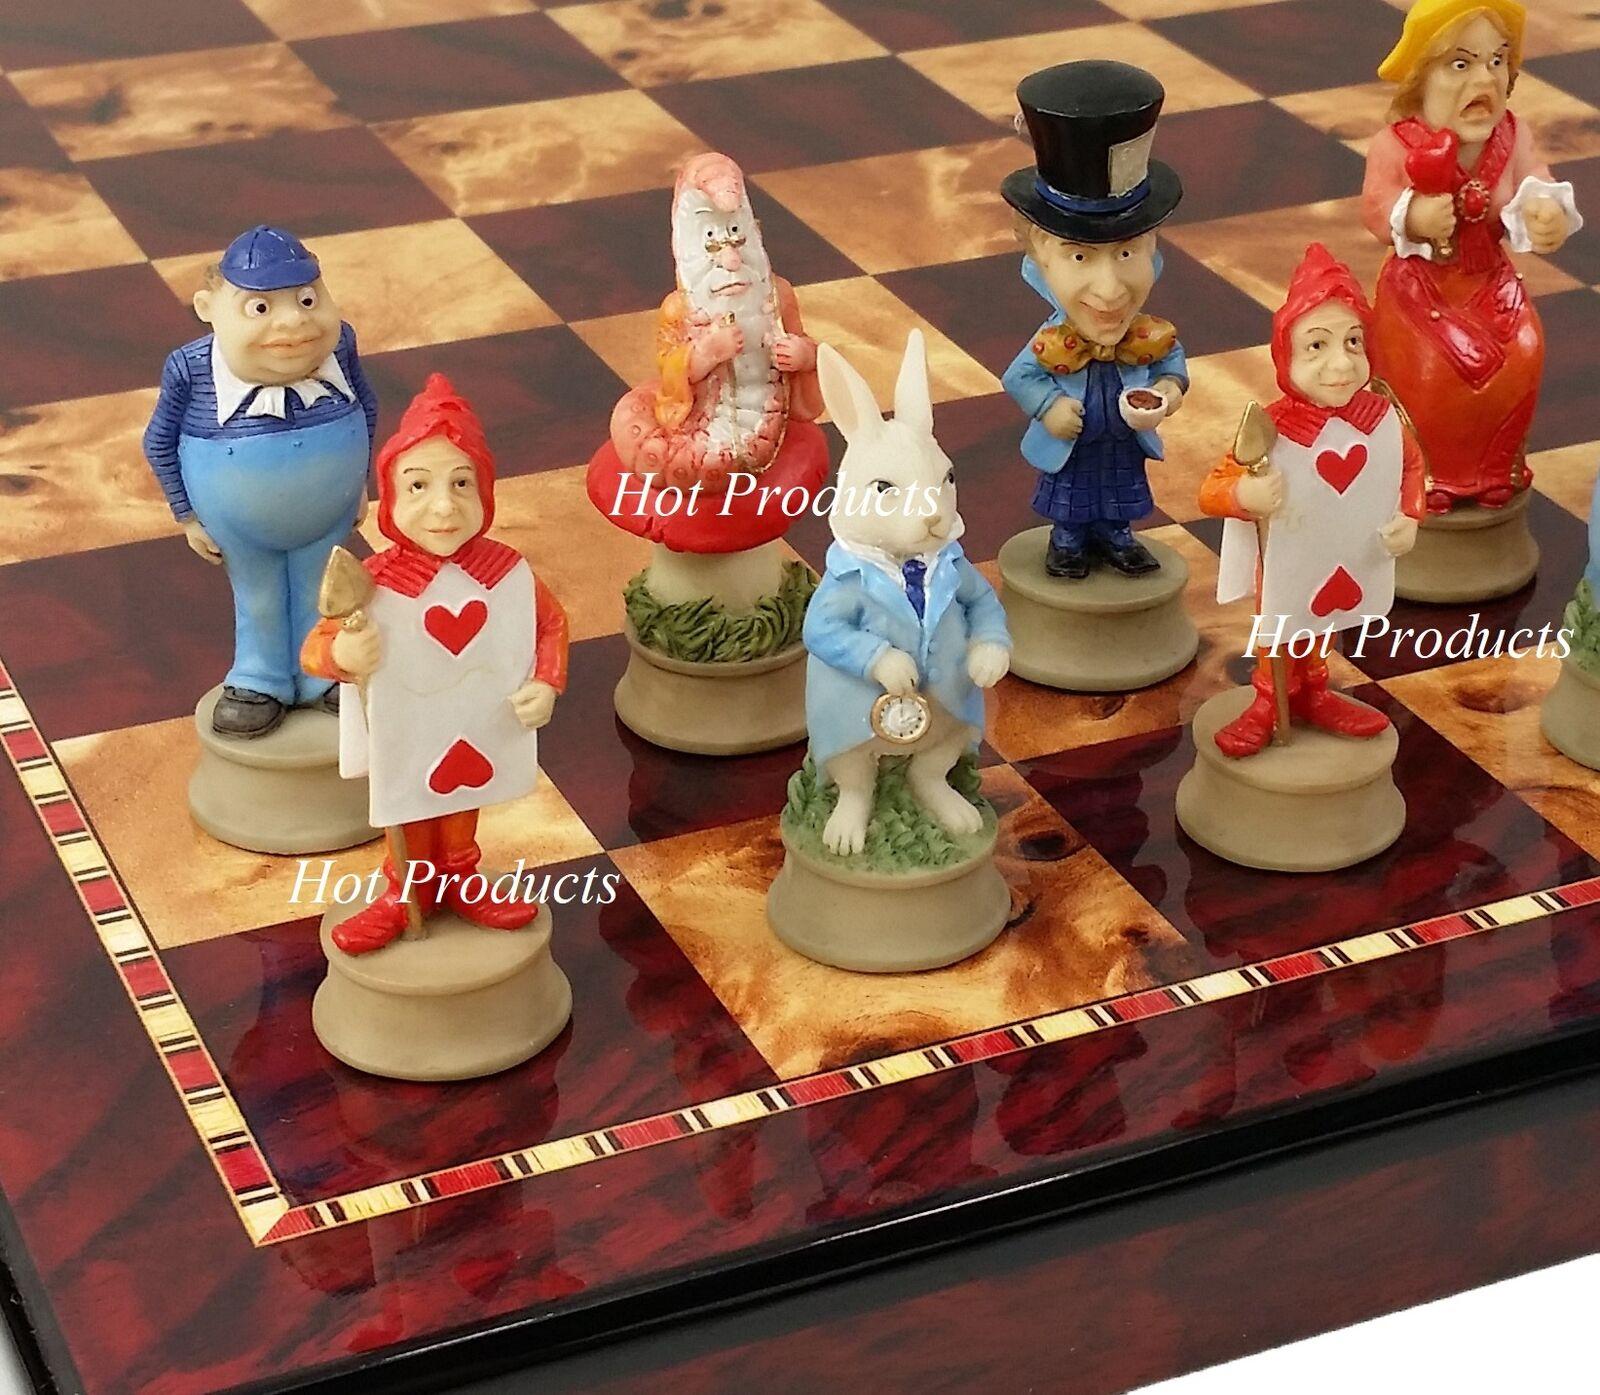 Alice in Wonderle fantasyc Chess Chess Chess Set W  18  Cherry Coloreeee tavola 16151a